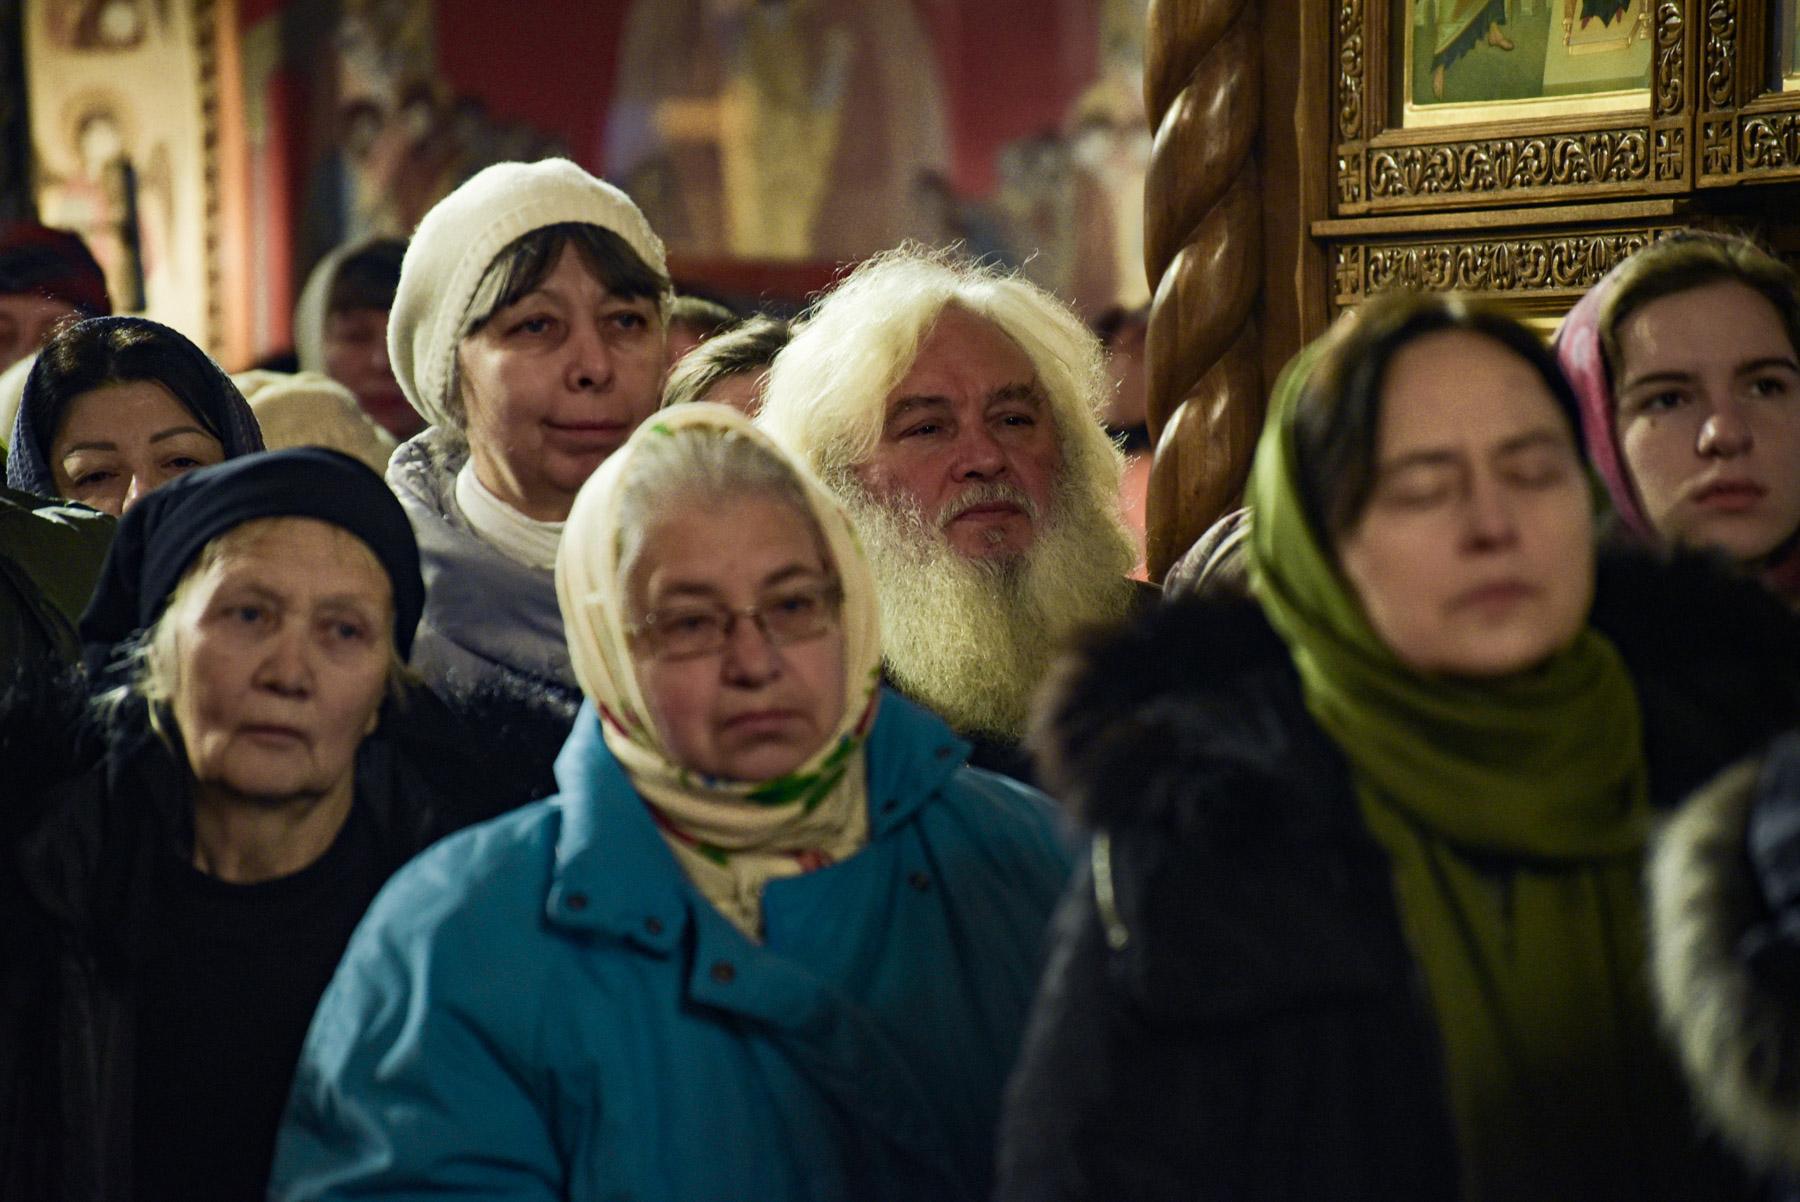 photos of orthodox christmas 0098 2